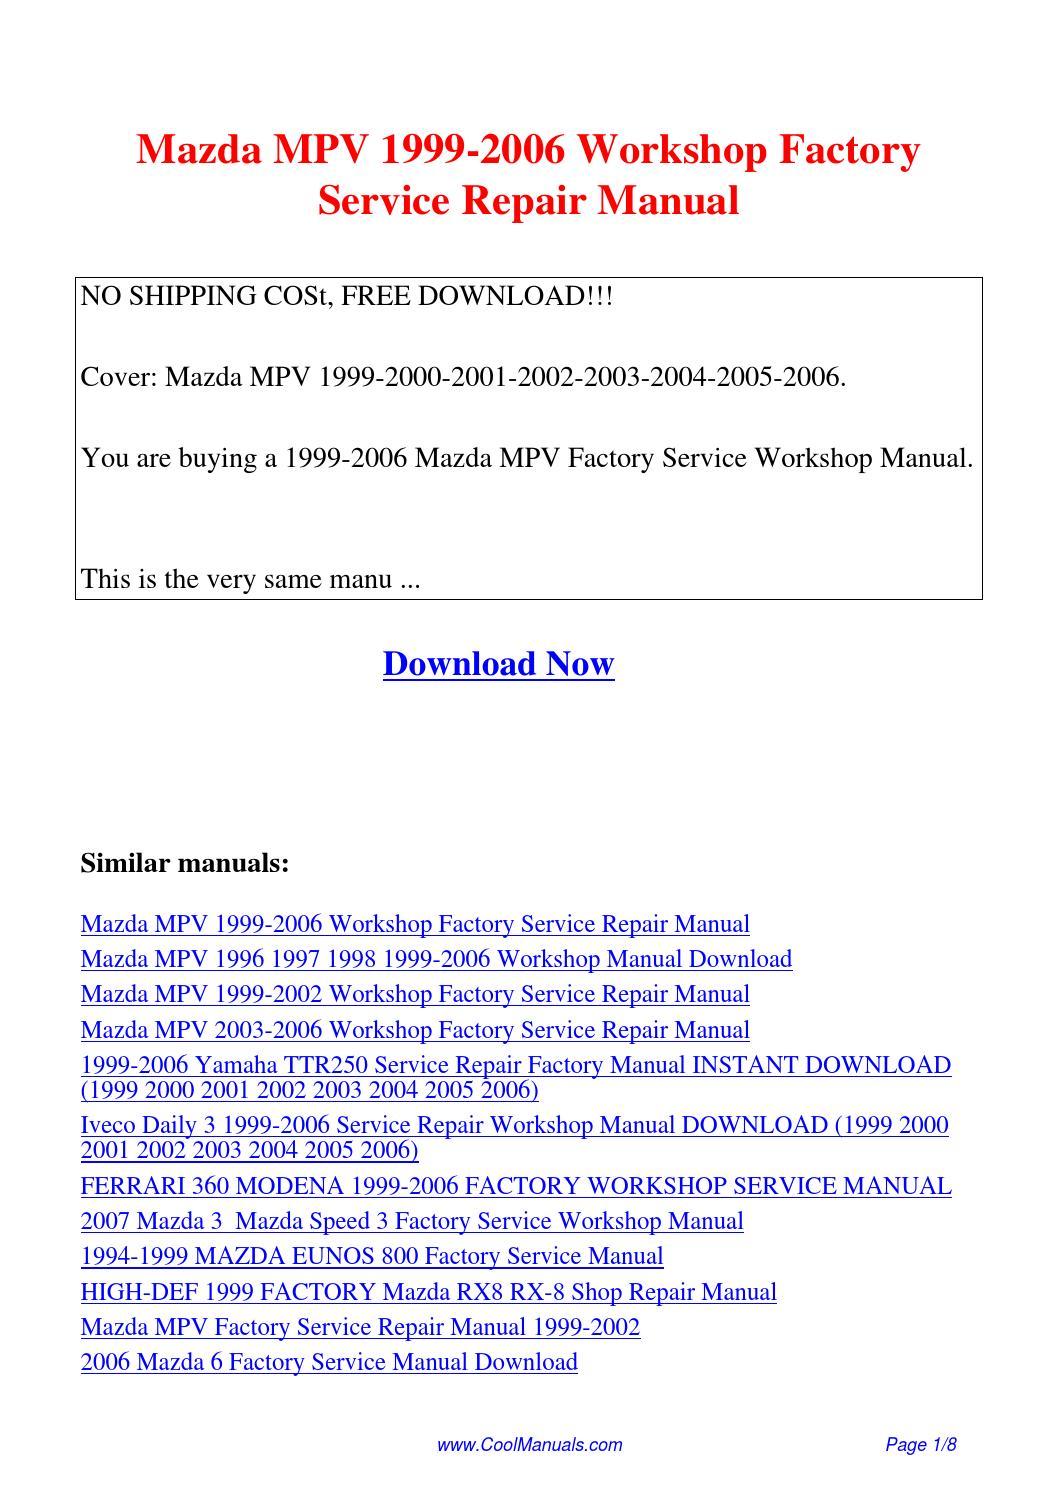 2005 mazda mpv manual